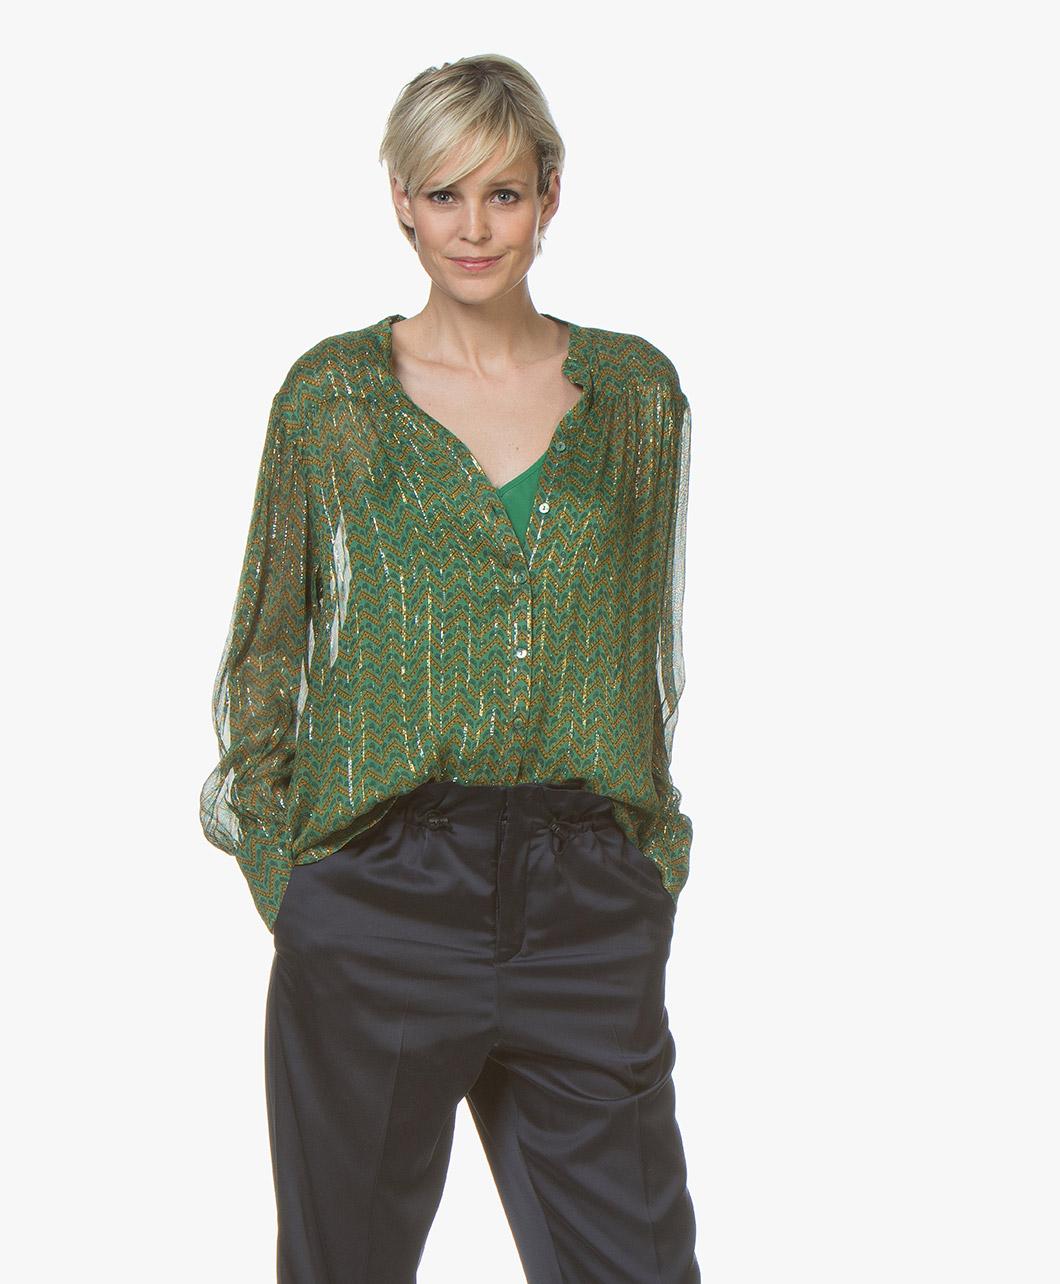 Afbeelding van ba&sh Blouse Wize Chiffon Print in Groen met Lurex